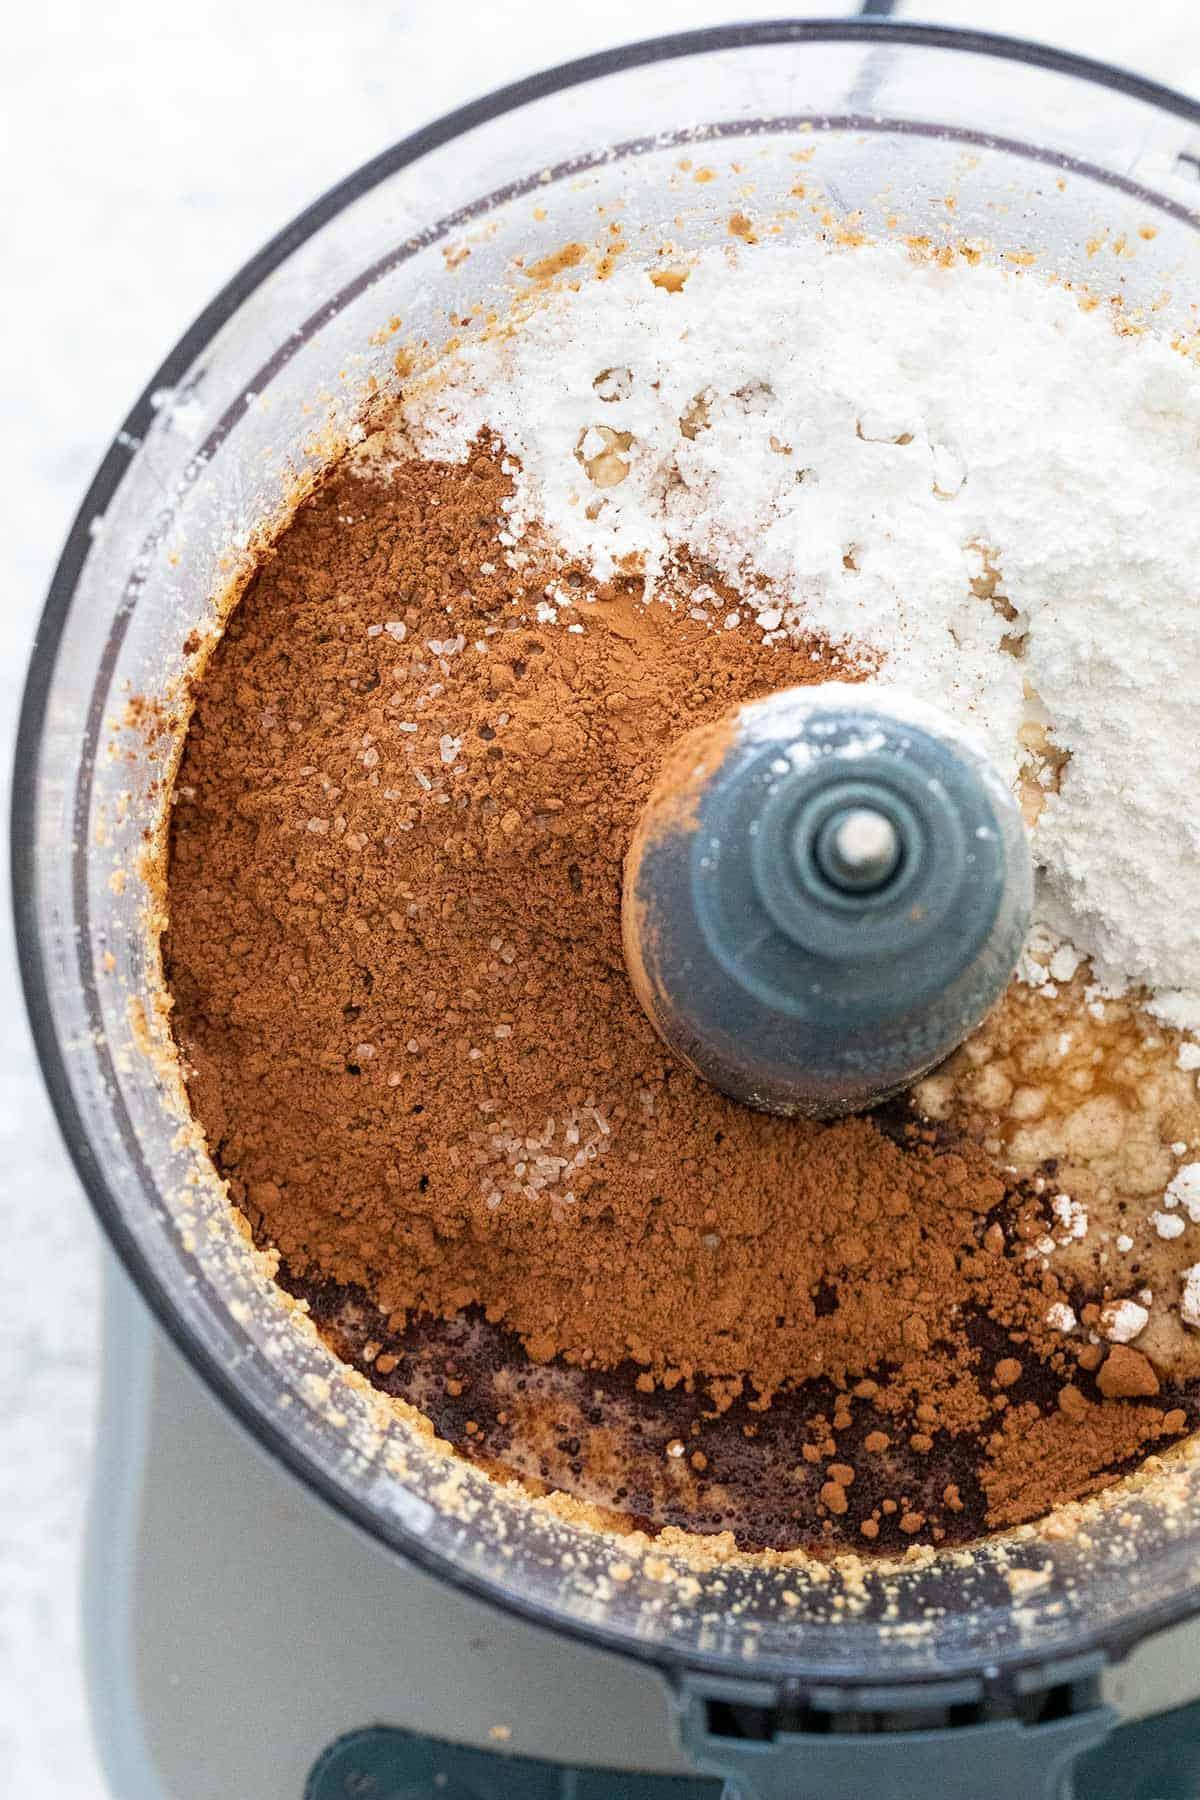 sugar and cocoa powder added to the processor